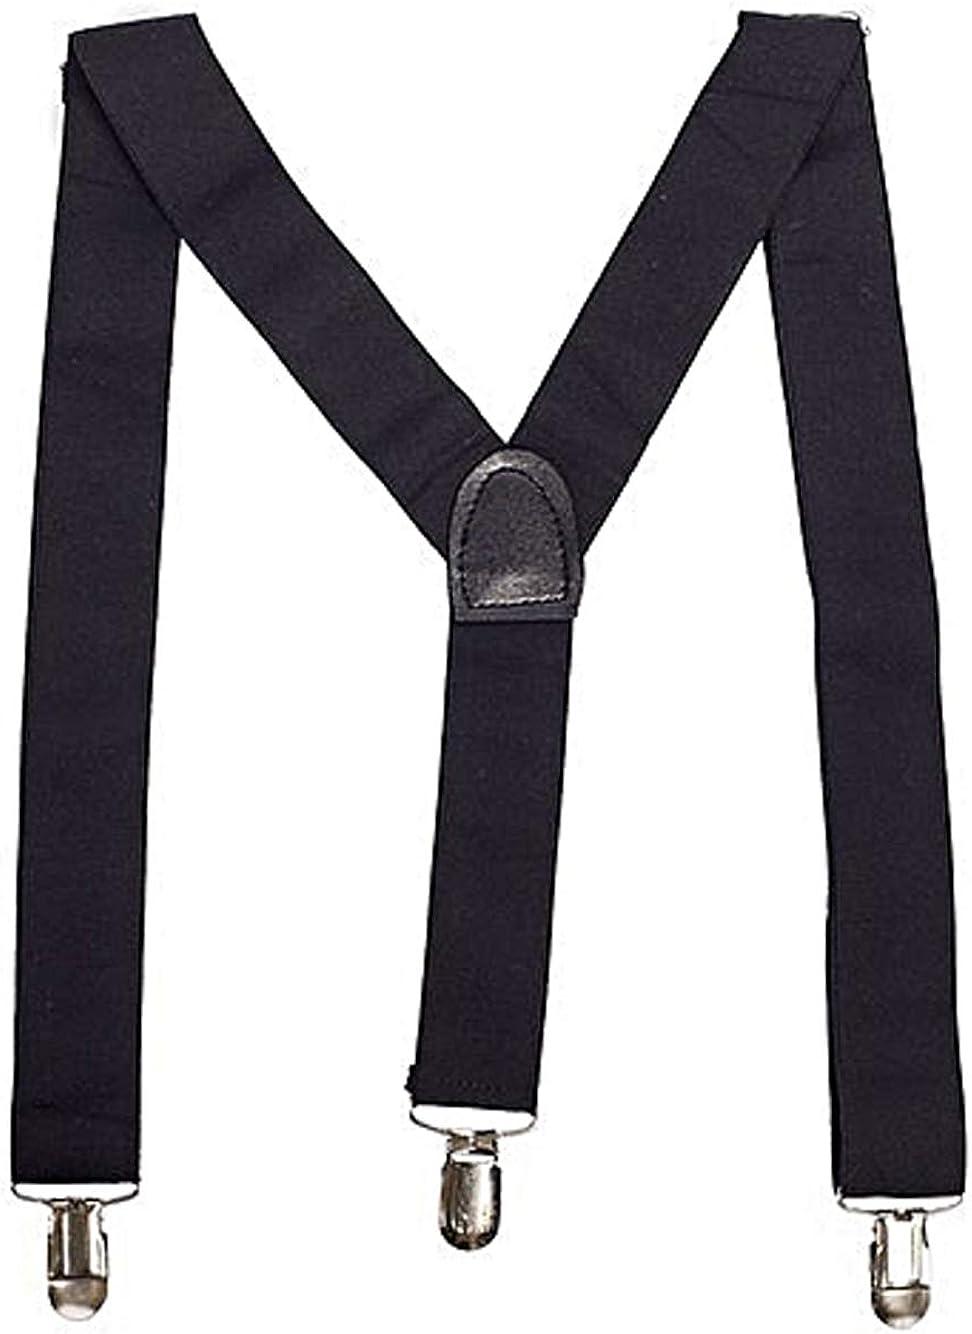 Ofidy Black Suspender